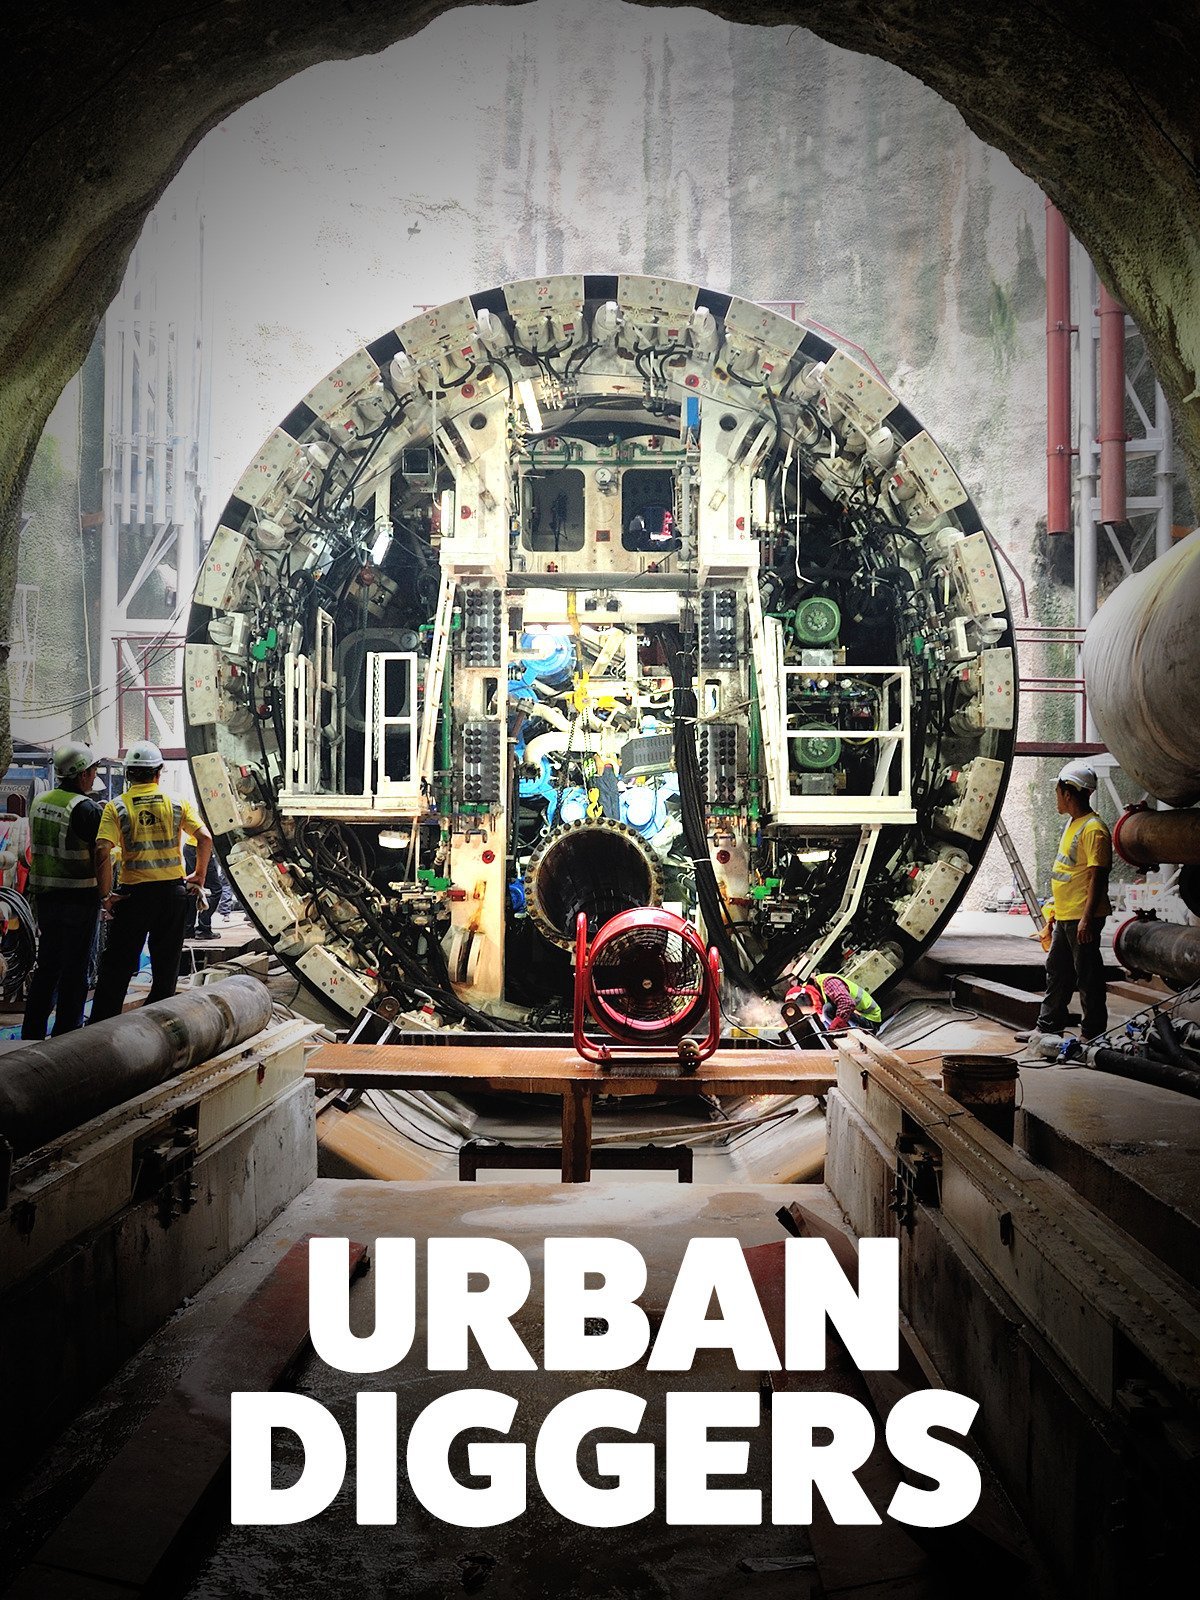 Urban Diggers